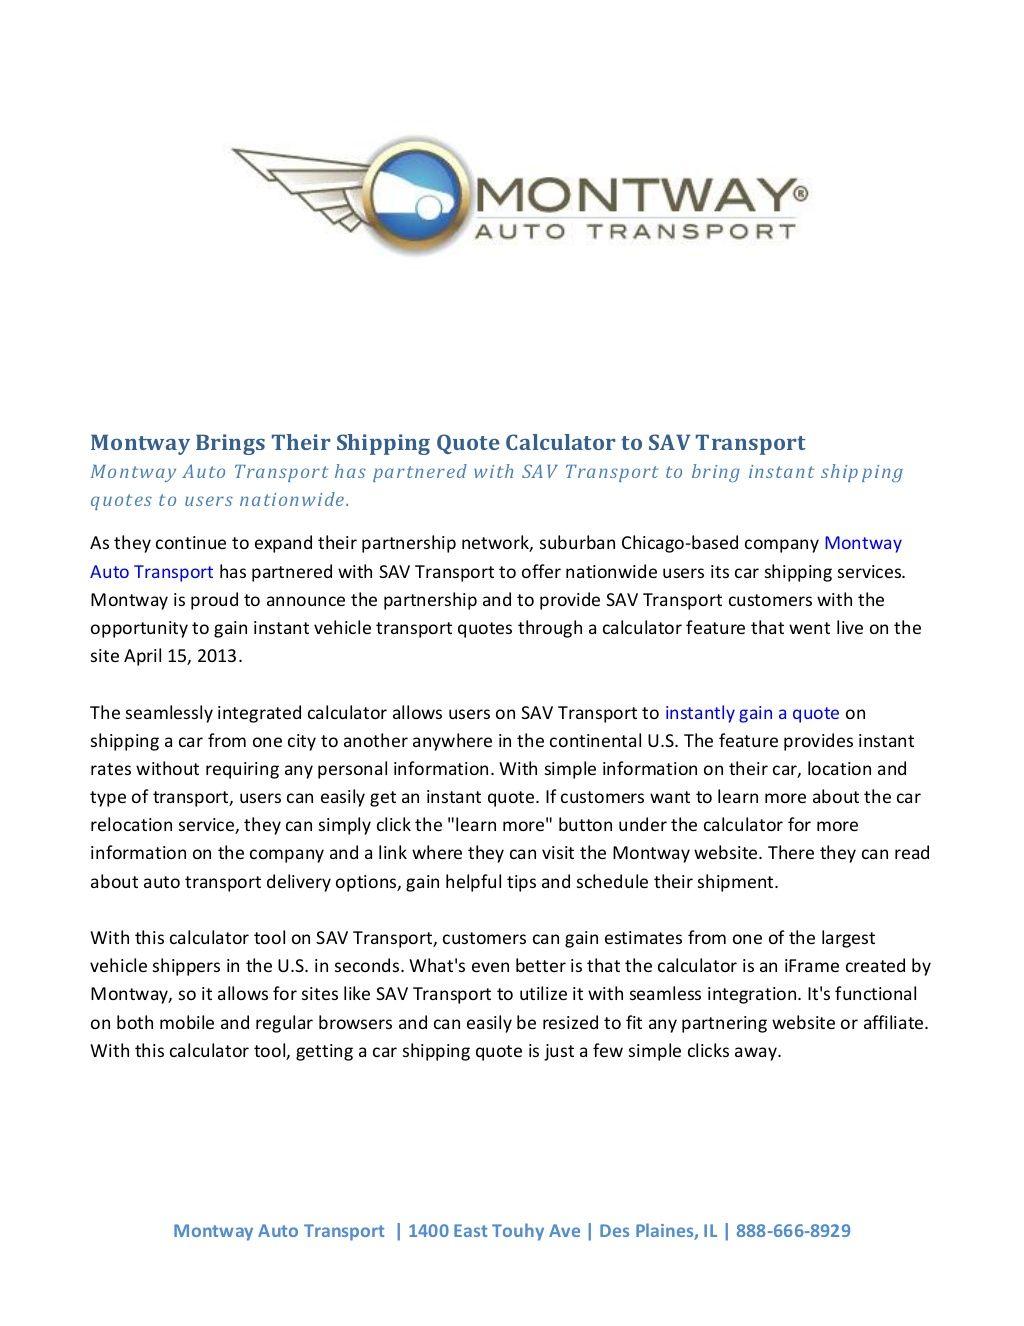 Auto Transport Quotes Montwaybringstheirshippingquotecalculatortosav Transport.